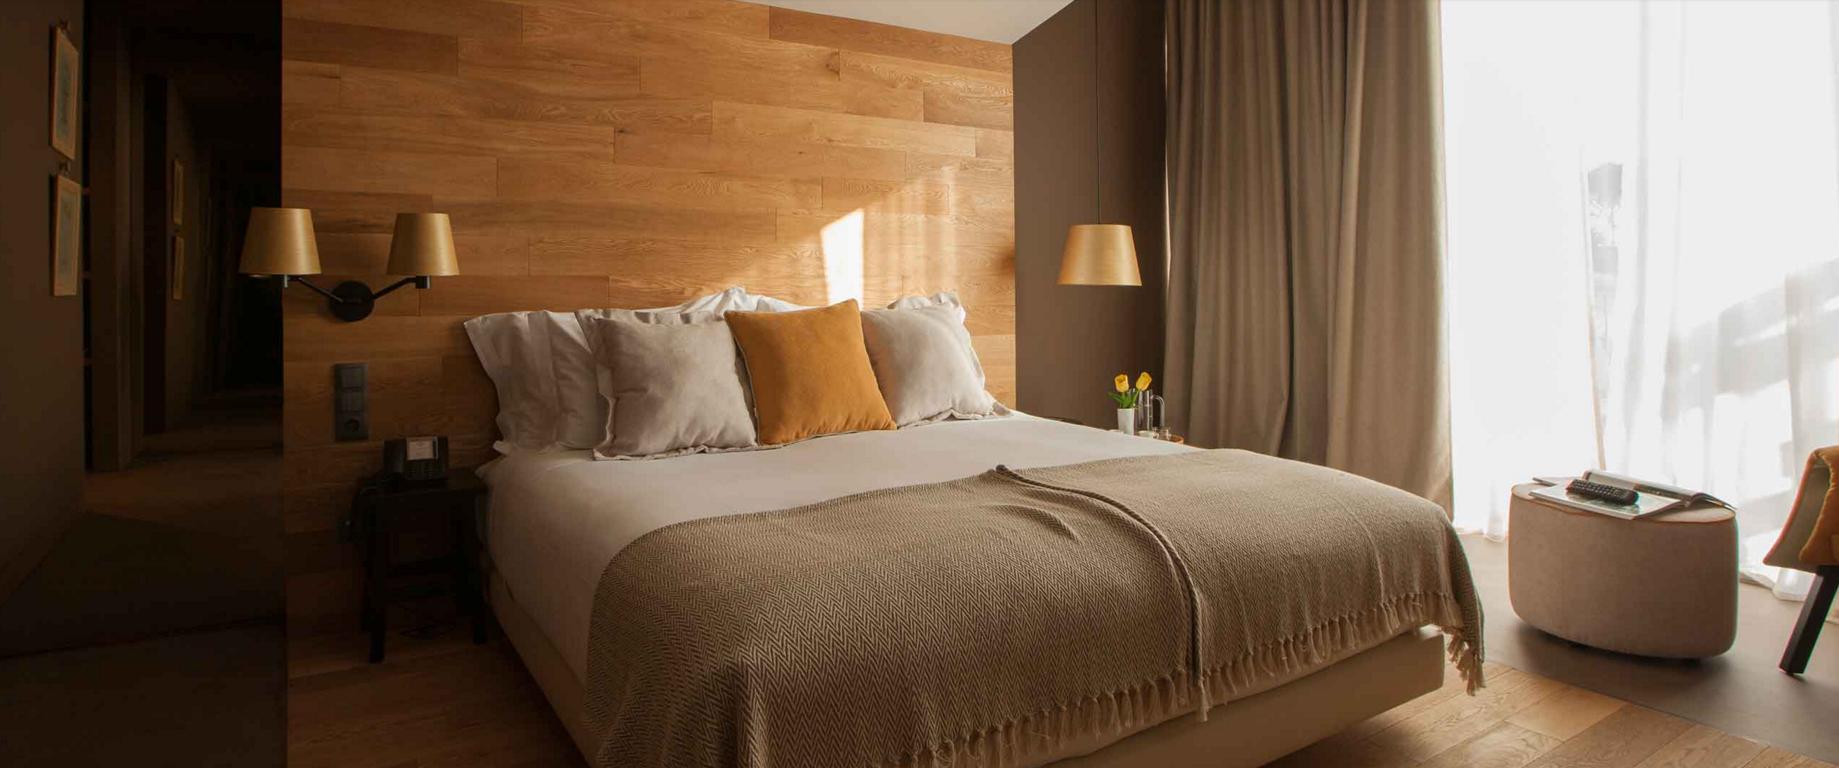 HOTEL RURAL-ALCOBAÇA